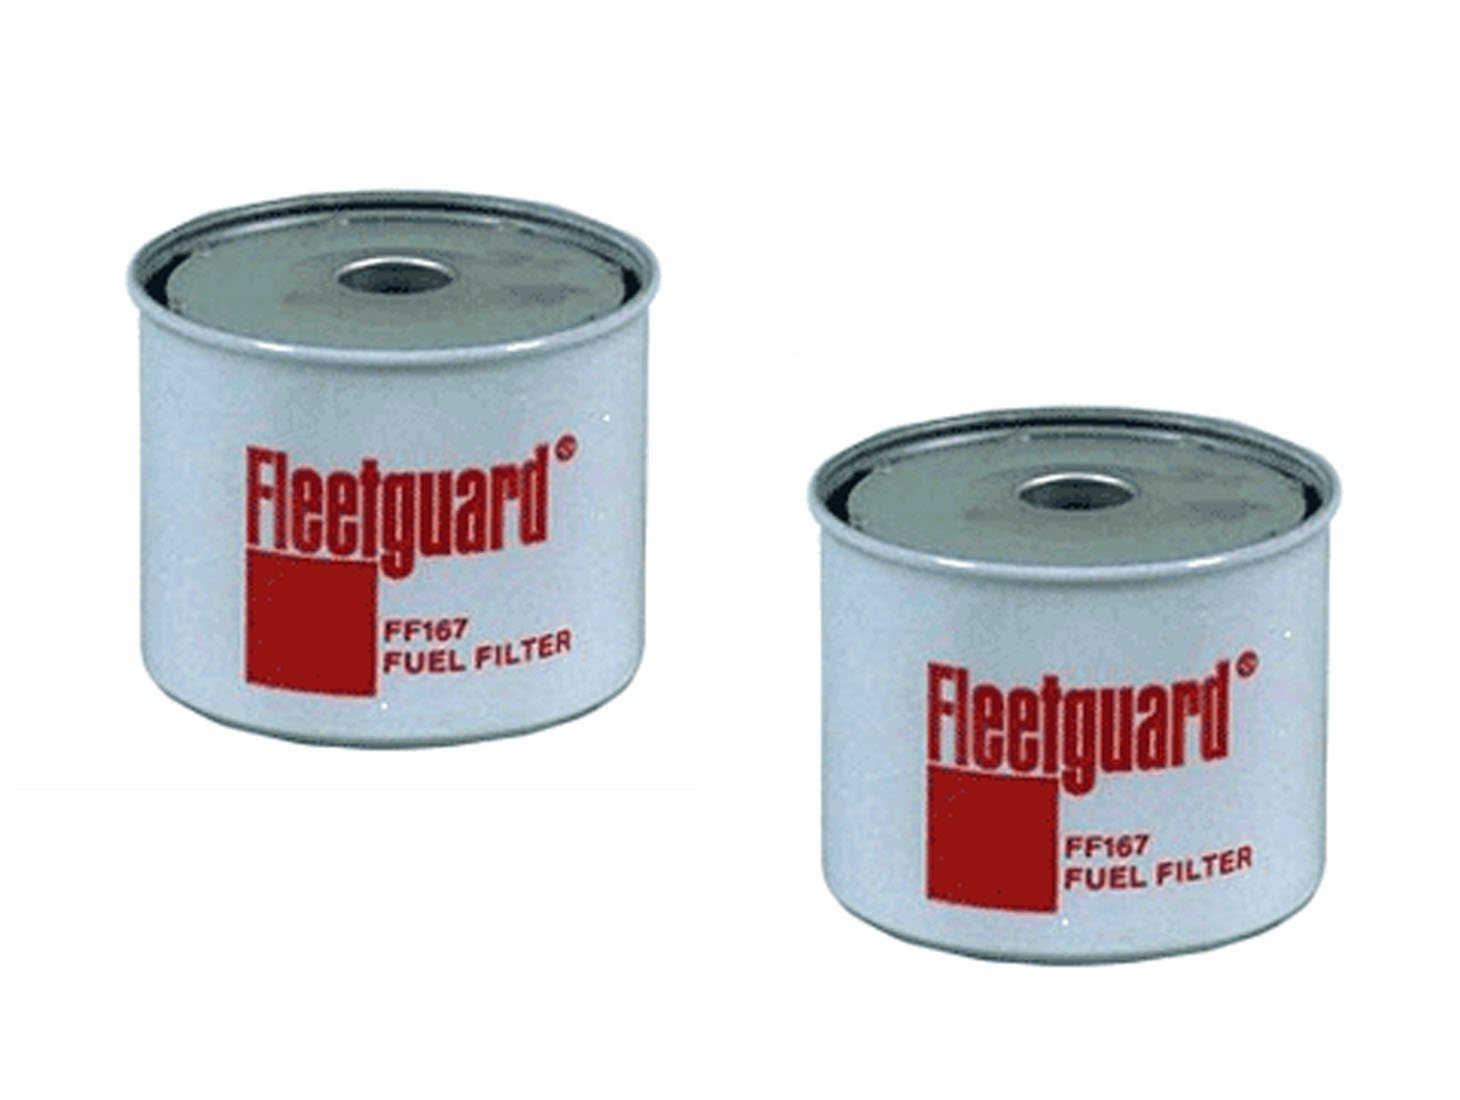 Ff167 Fleetguard Tractor Fuel Filter Multipack Of 2 Bobcat Filters Fits Allis Chalmers Case Ih Ford Gehl Farmall John Deere Kubota